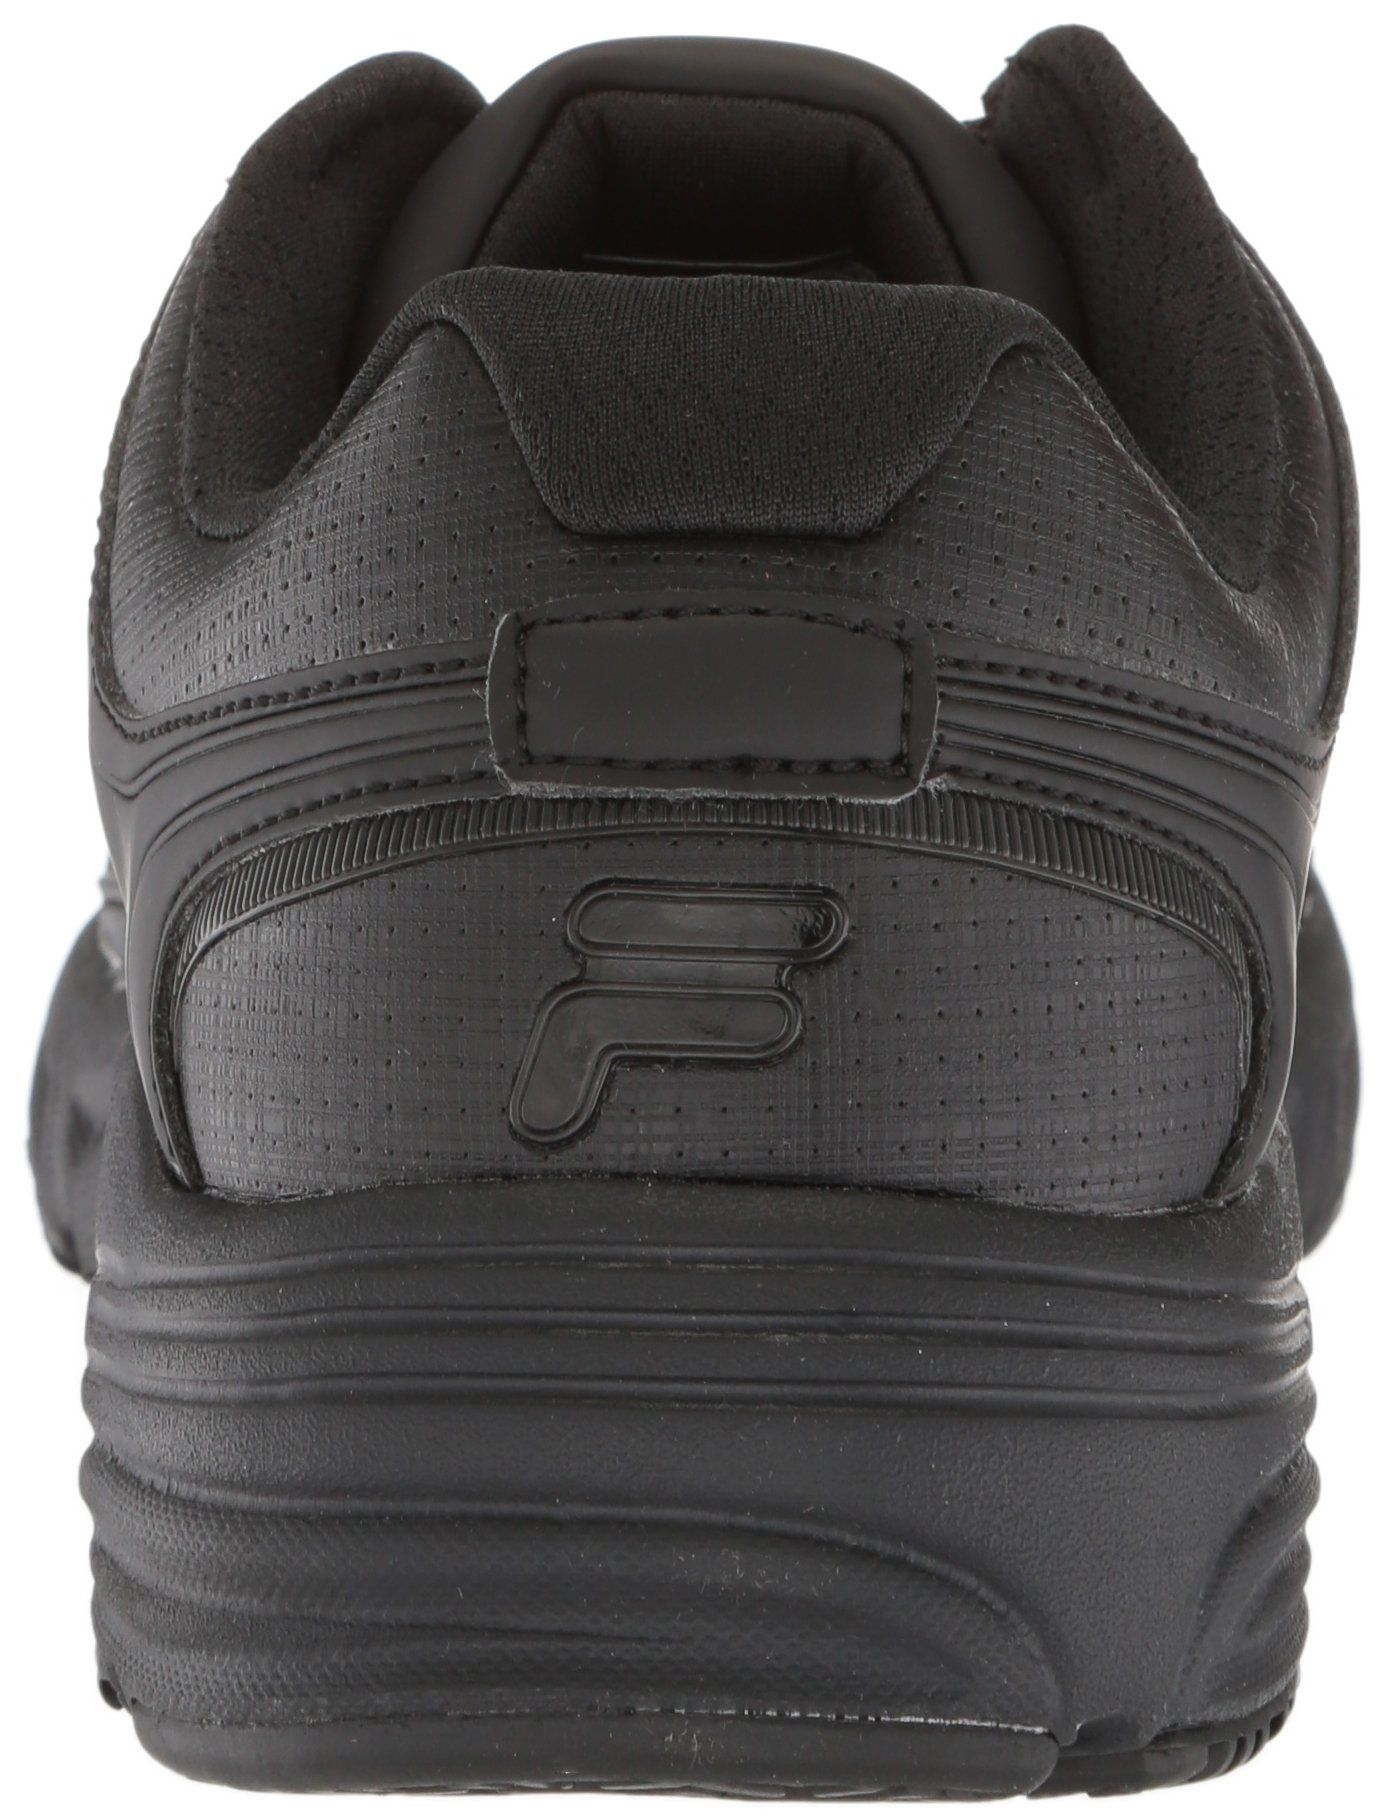 6446a9c286d6 Fila Women's Memory Fresh Start 2 Slip Resistant Work Shoe     Be ...